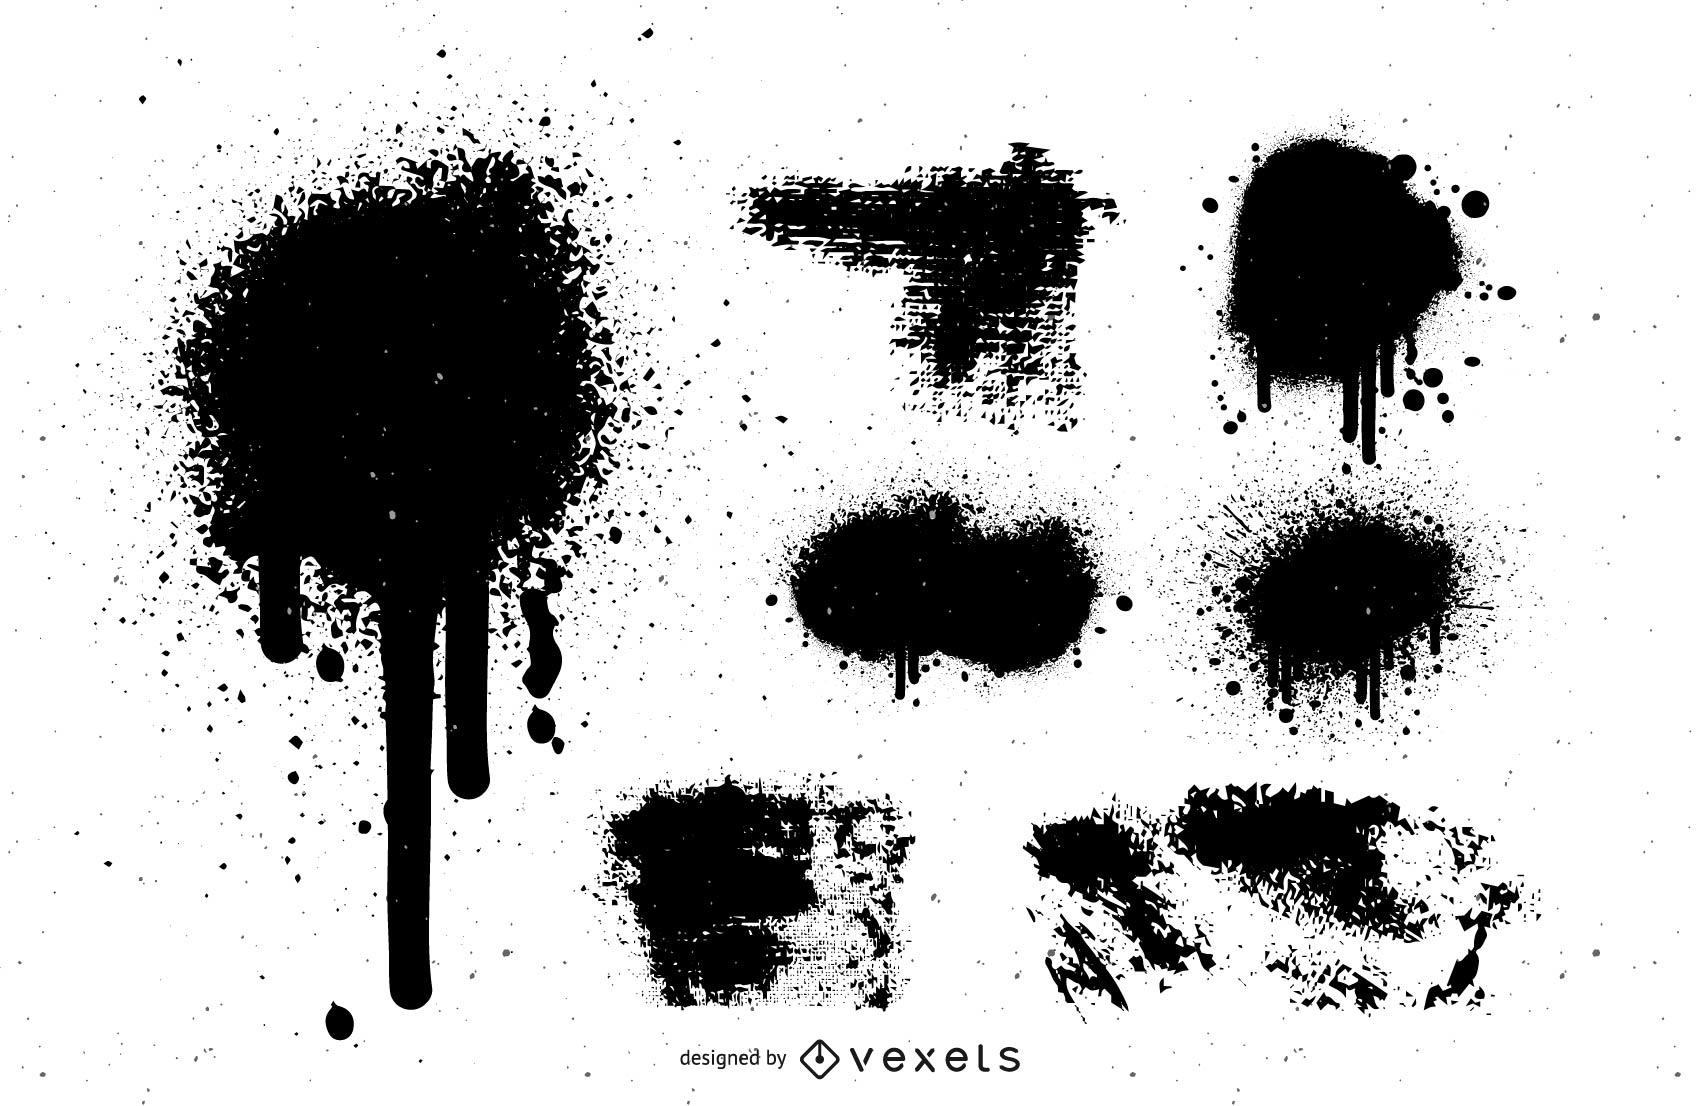 Set of black grunge stains